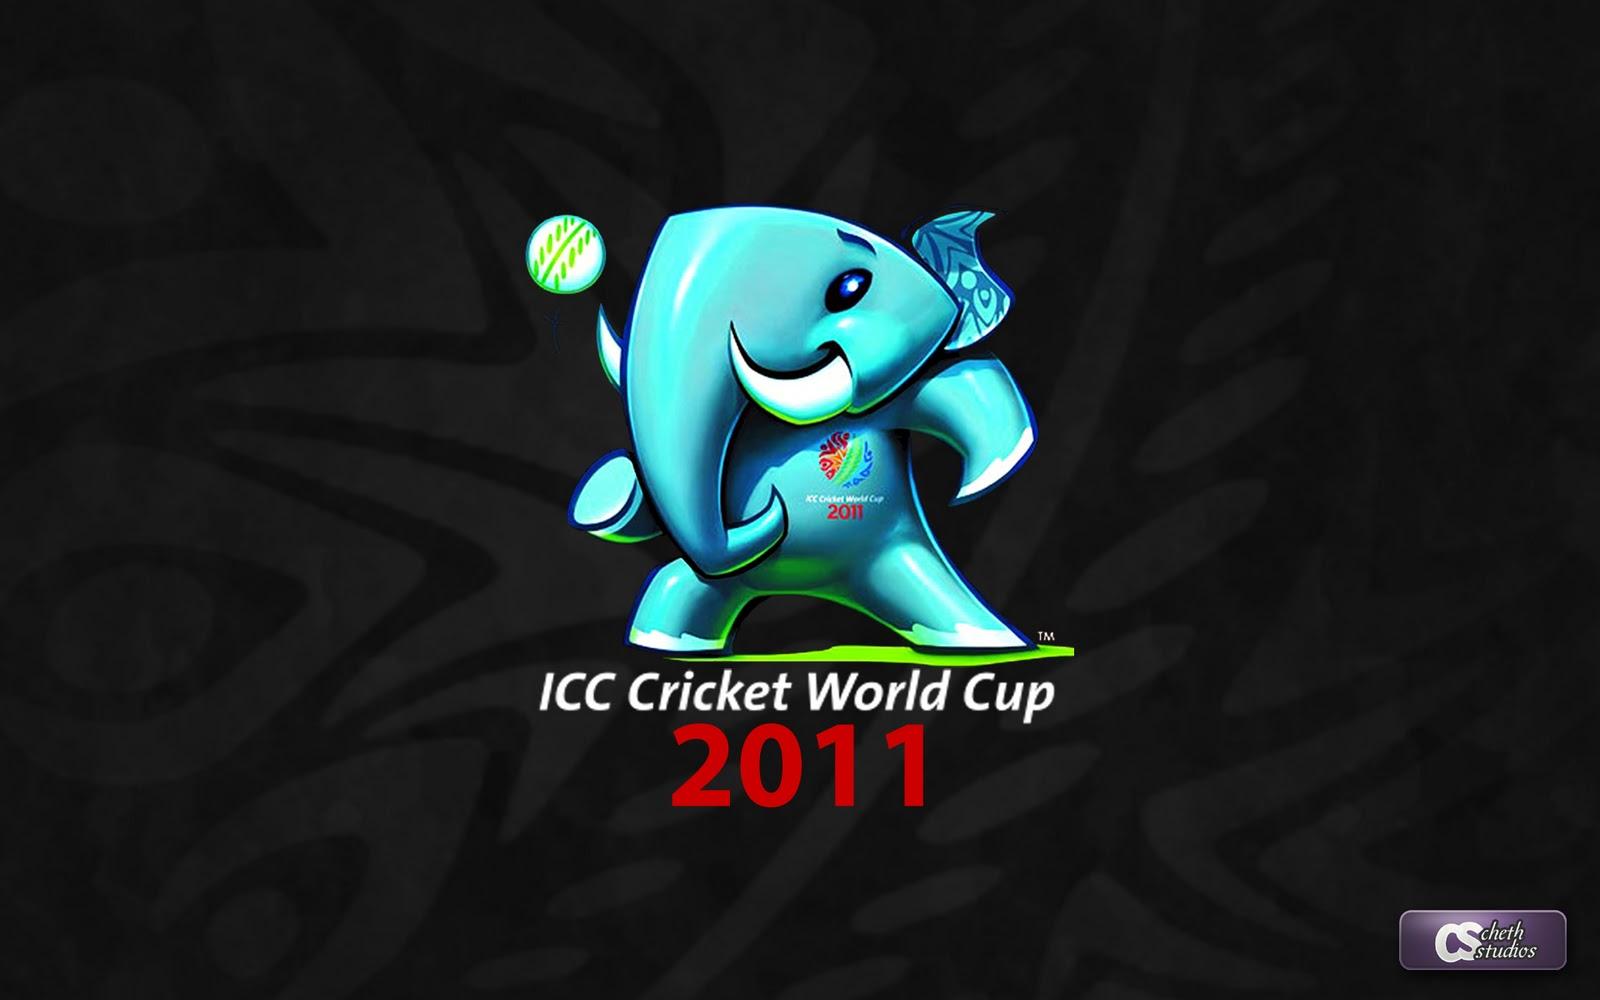 http://3.bp.blogspot.com/_bIDM70GluWY/TUvOi1L-nTI/AAAAAAAAAKk/6vk8-rYsCF8/s1600/icc-cricket-world-cup-2011-wallpapers%252525255Bworld4free.in%252525255D%25252B%252525252811%2525252529.jpg